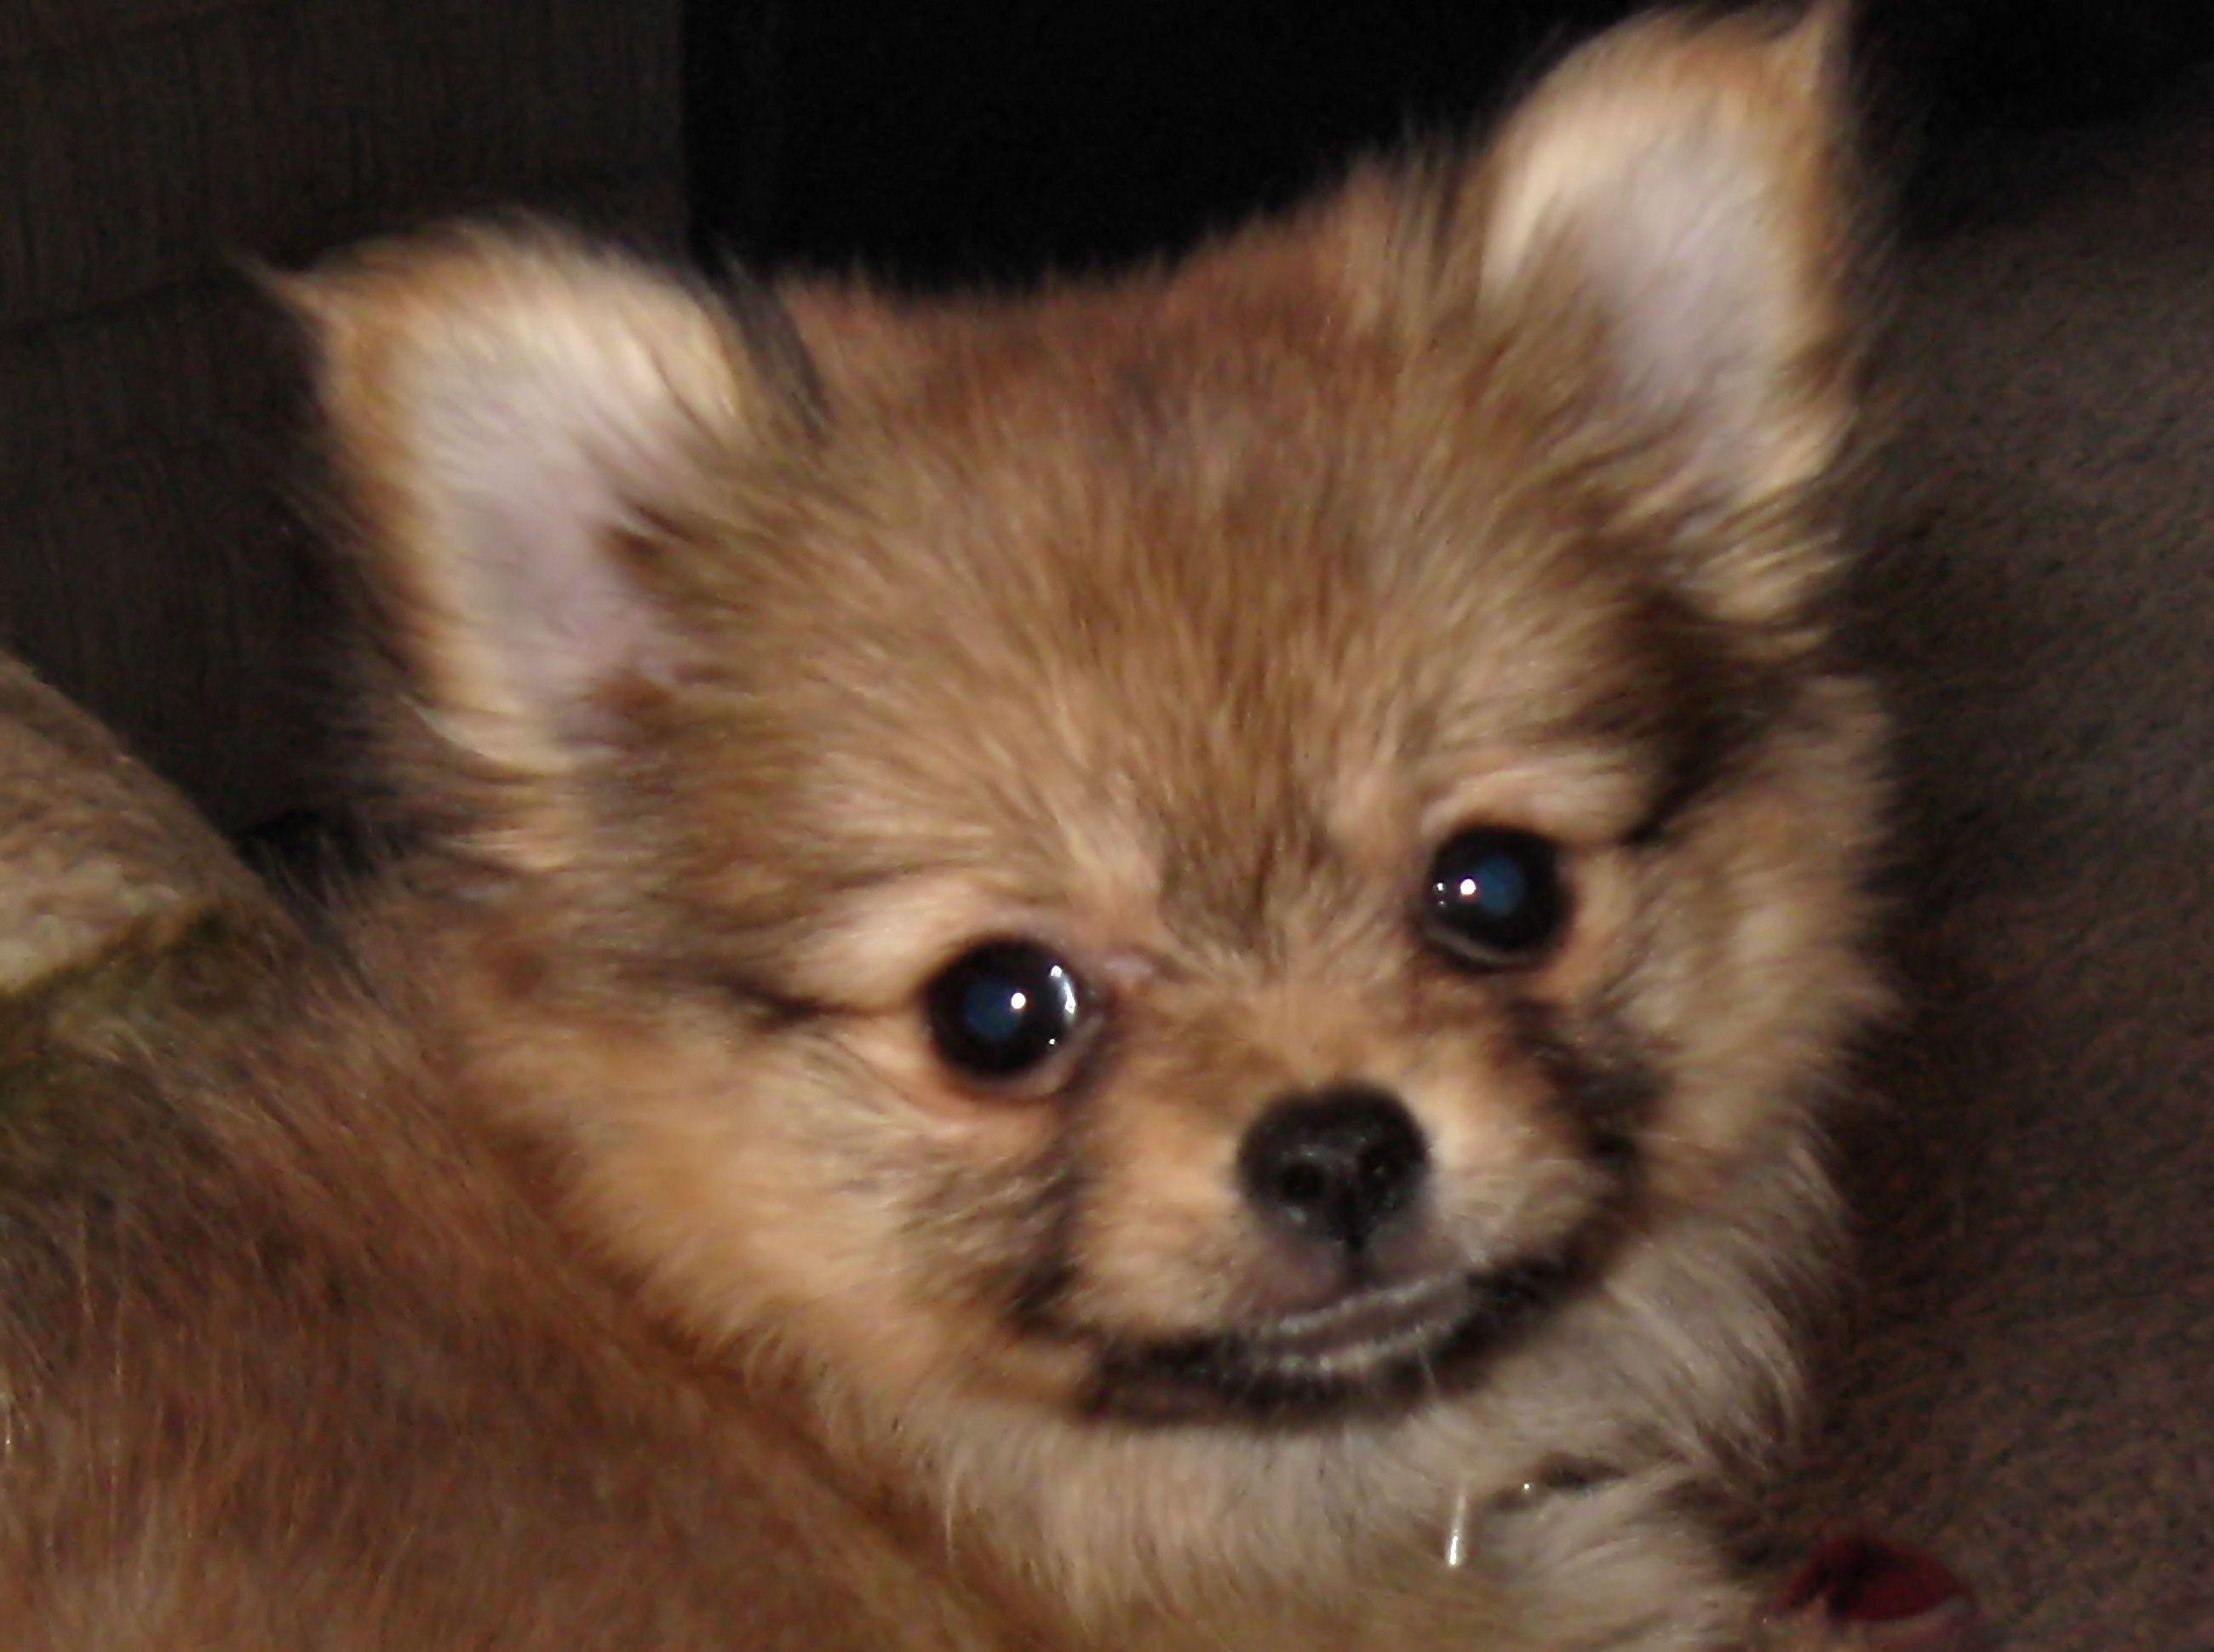 Pics photos dachshund chihuahua dog mix dogs pictures photos pics - Chihuahua Blue Merle Mix Chihuahua Pomeranian Mix Black And White M5x